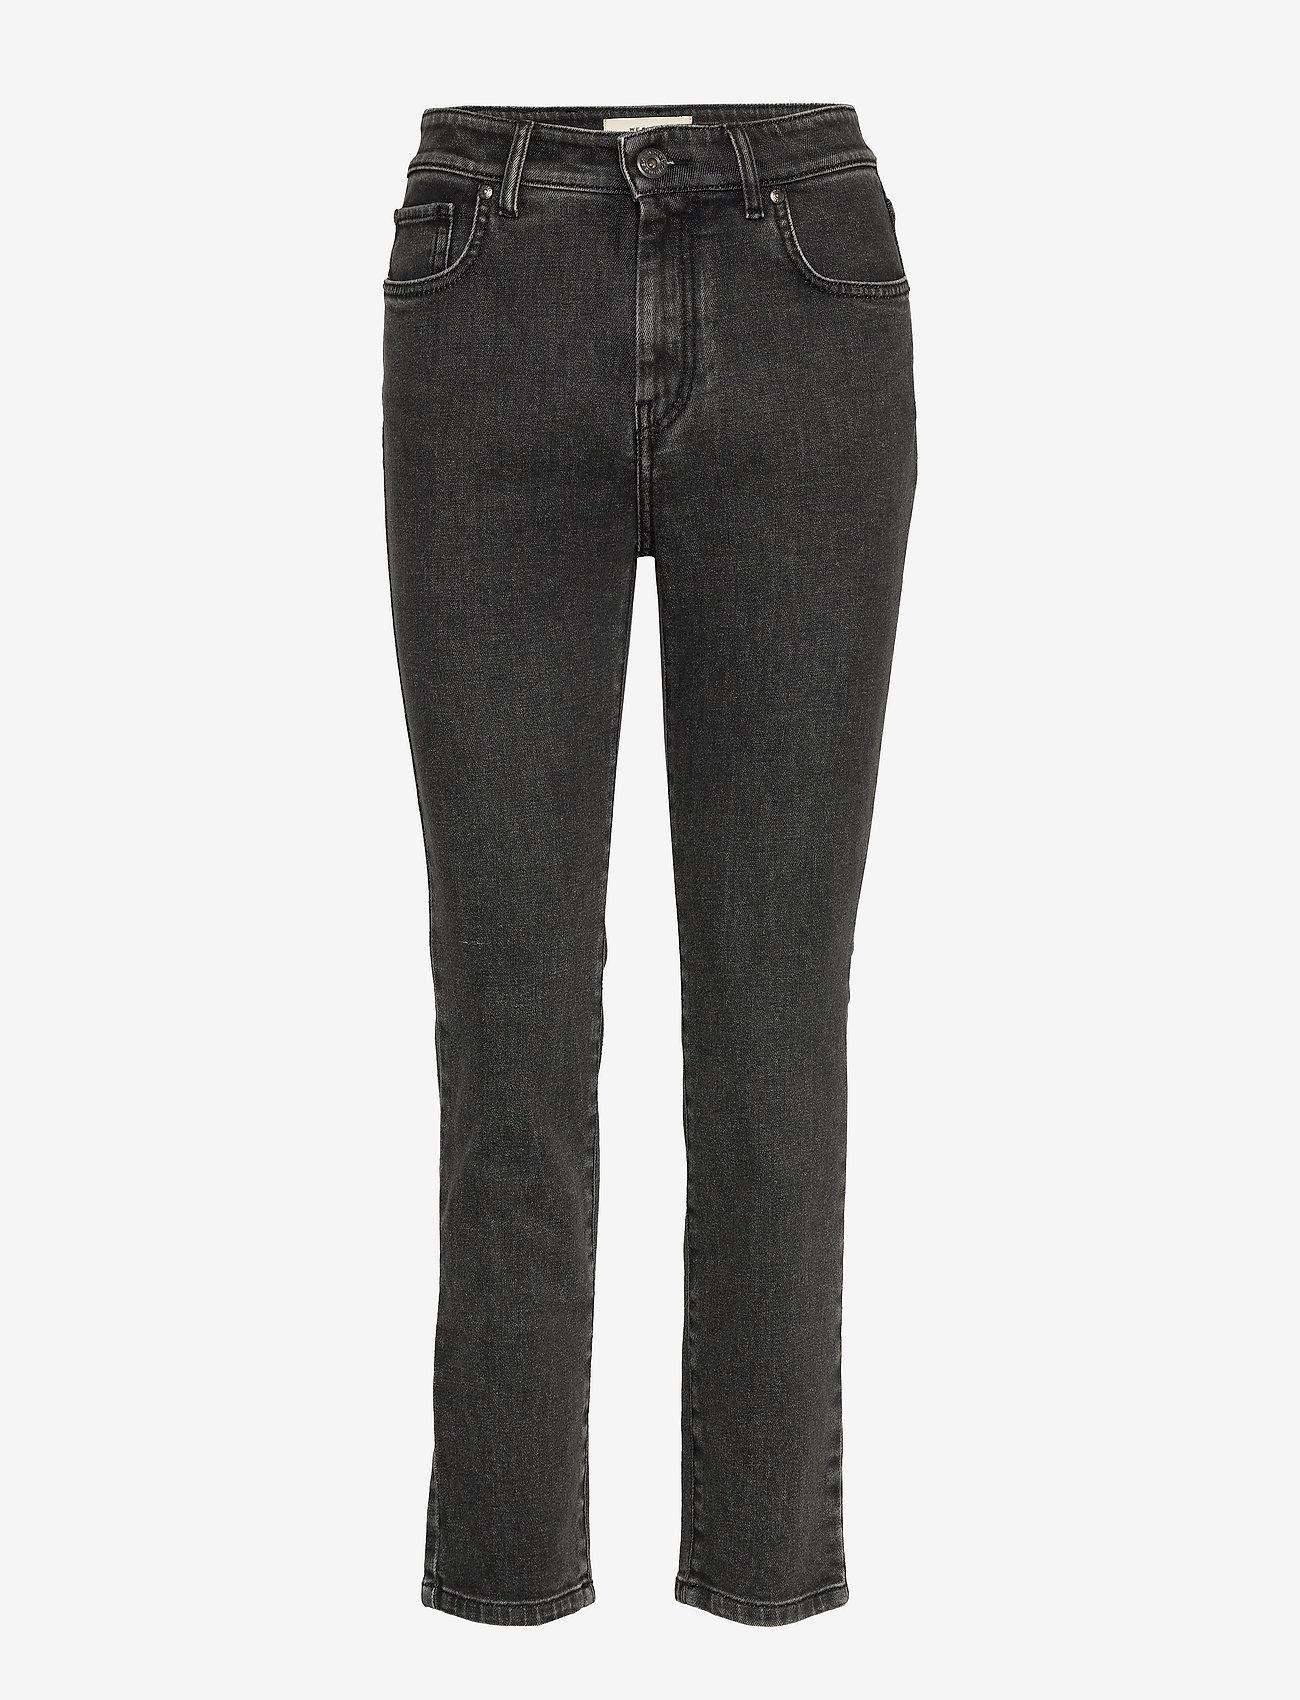 Weekend Max Mara - FINANZA - slim jeans - black - 0